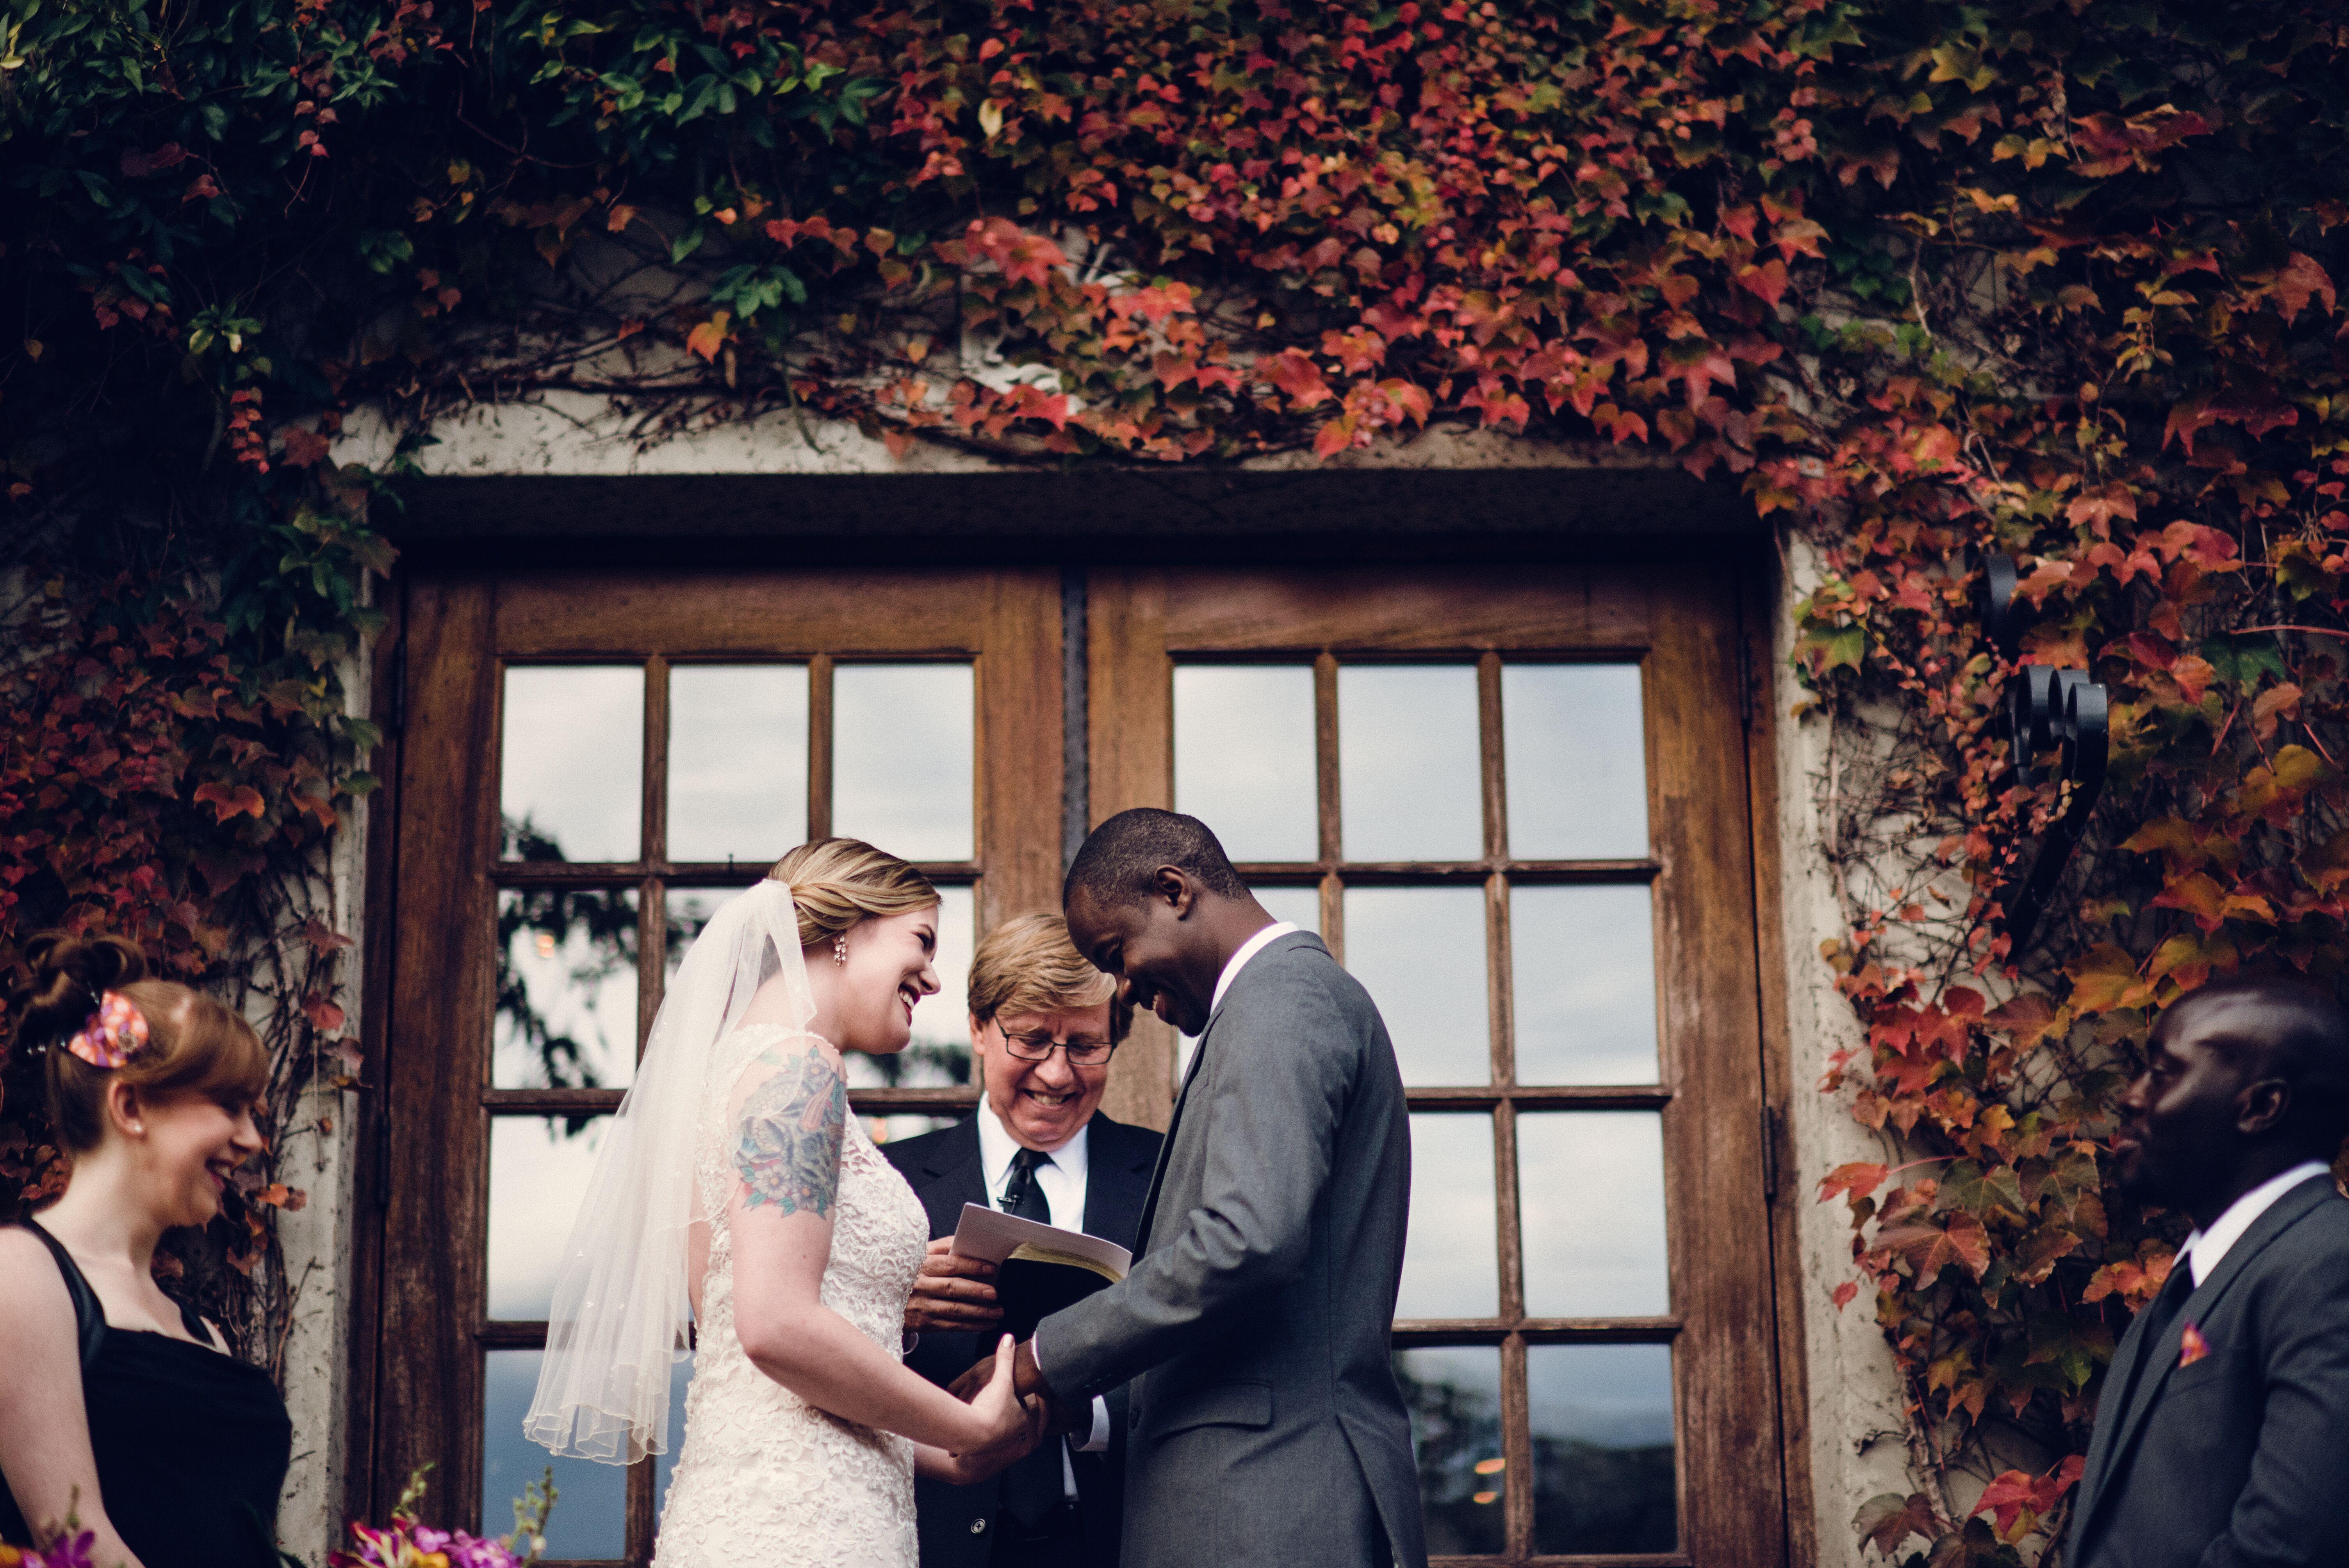 Kenyan Wedding Ceremony Traditions